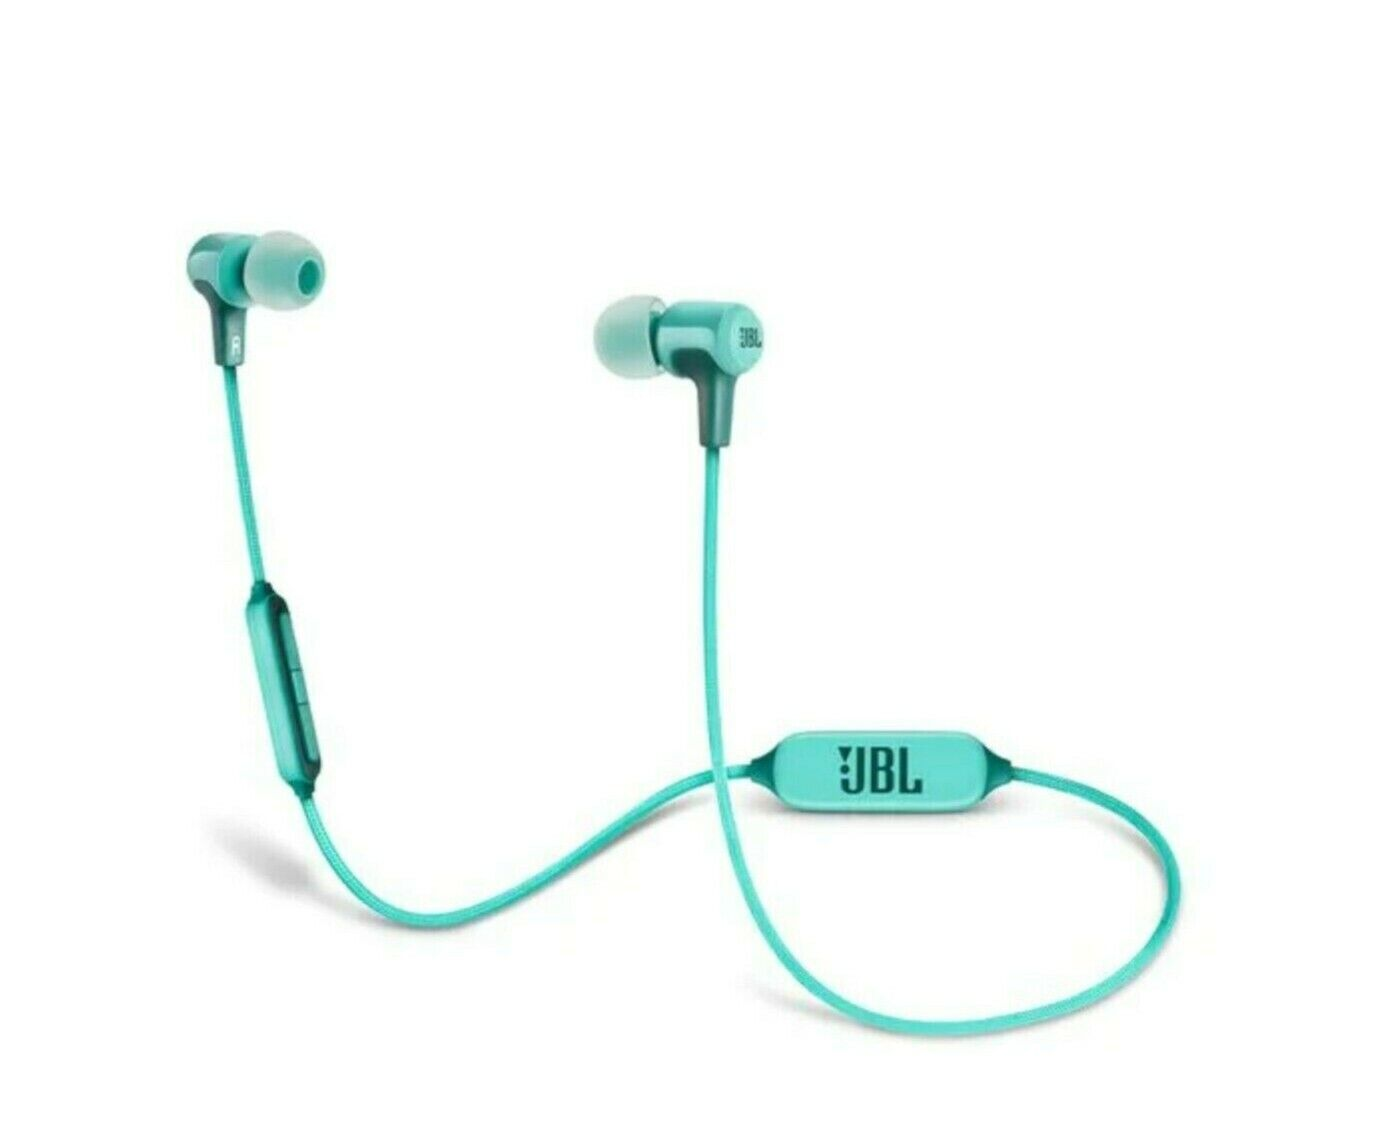 E25BT JBL Wireless in-ear headphones UP TO 8 HR Batt/Life